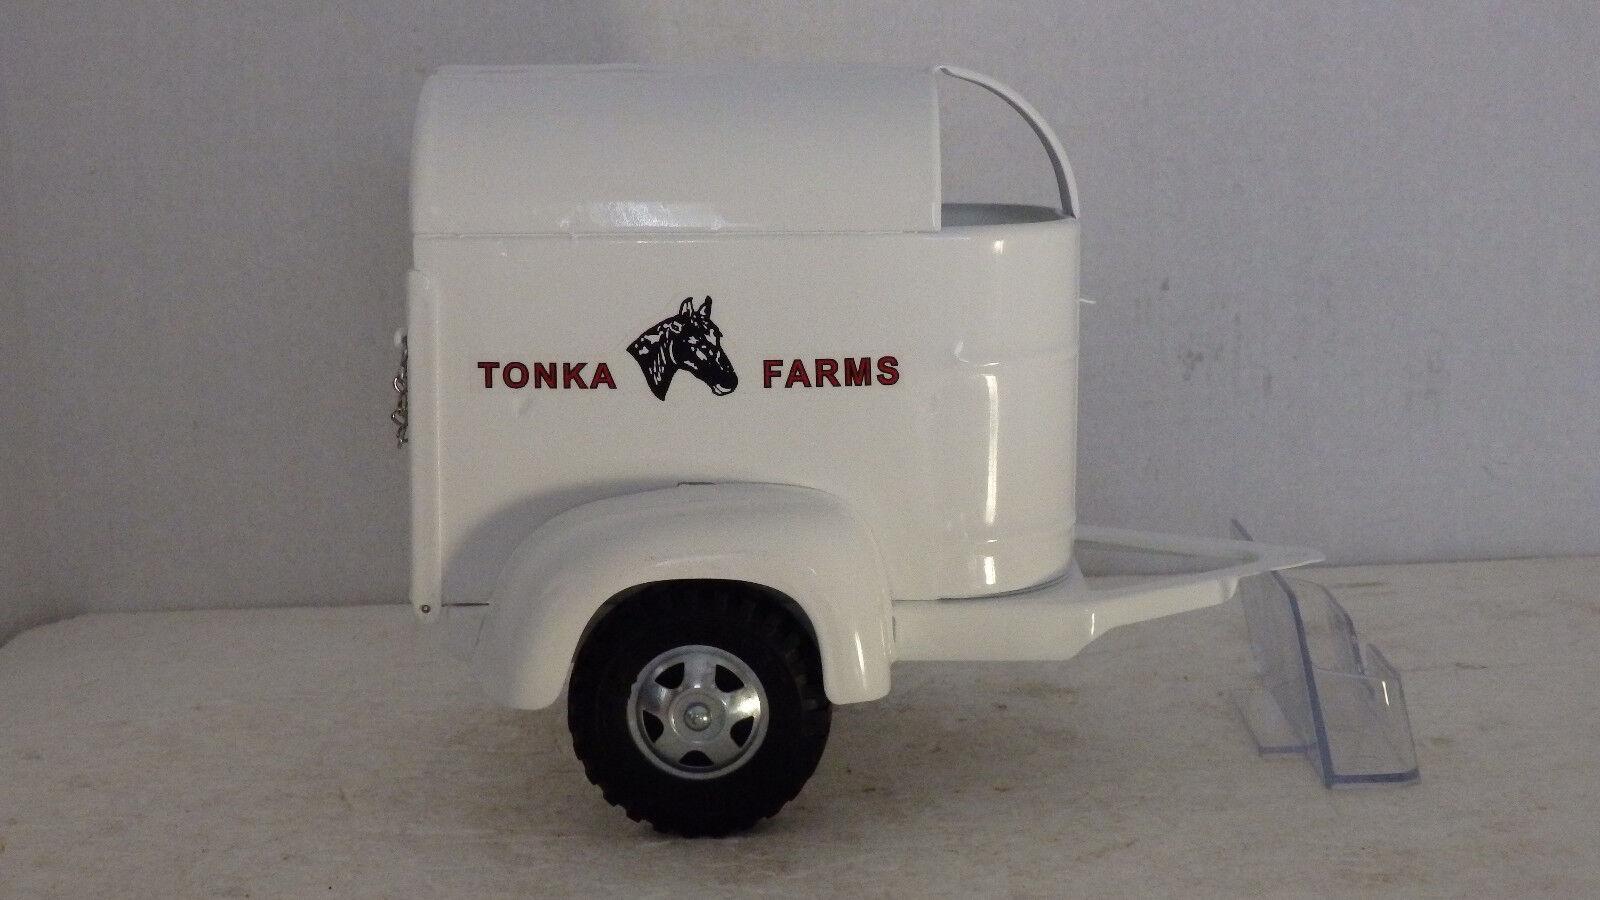 Tonka granjas remolque de caballos para camiones de 53-58 pin type Enganche